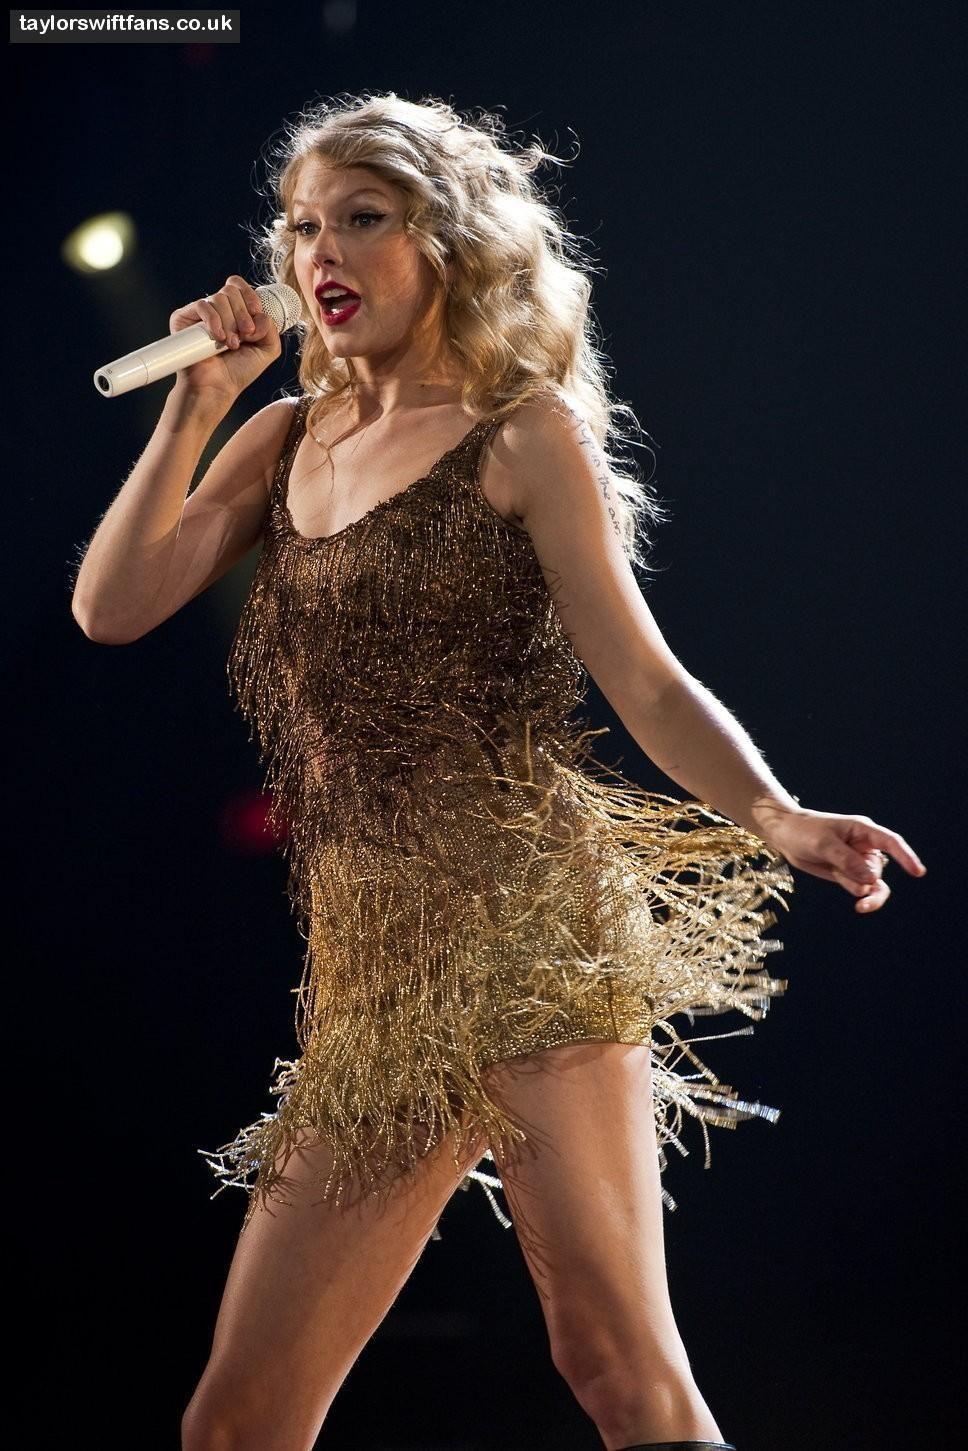 Taylor Swift Sparks Fly Speak Now Tour Daedalusdrones Com